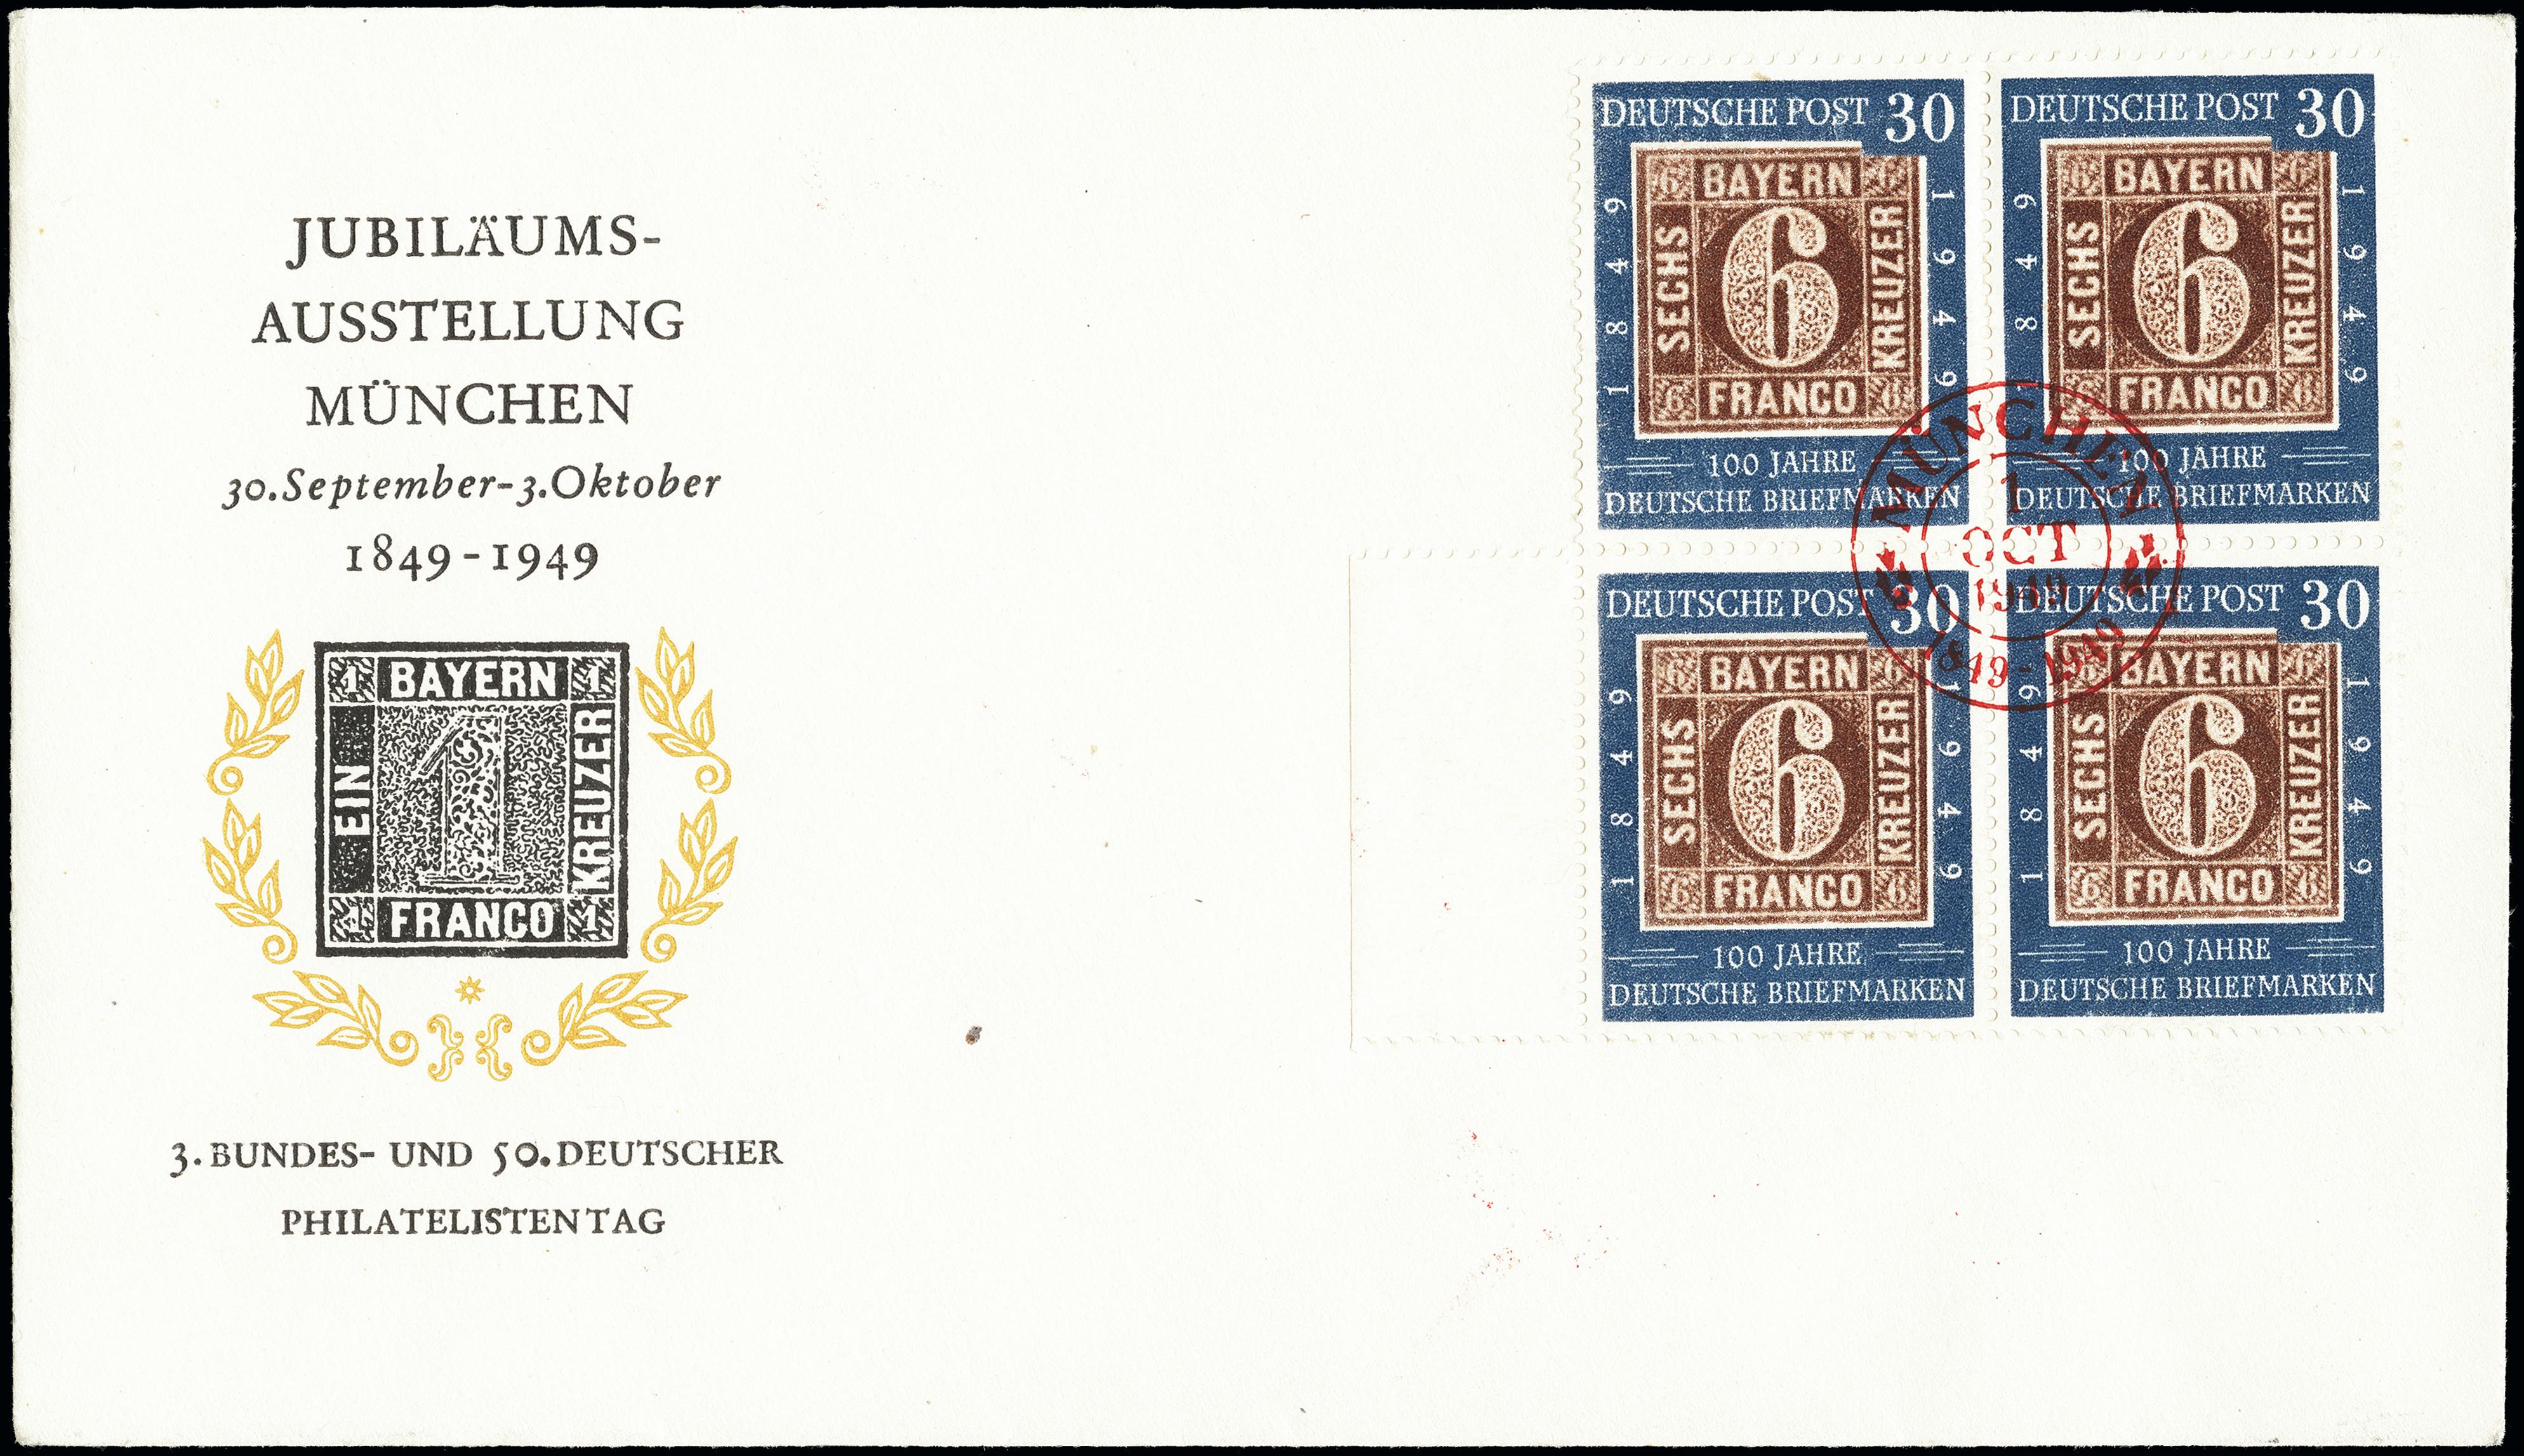 Lot 2809 - germany after 1945 federal republic of germany -  Heinrich Koehler Auktionen Heinrich Köhler Auction 376 - Day 1